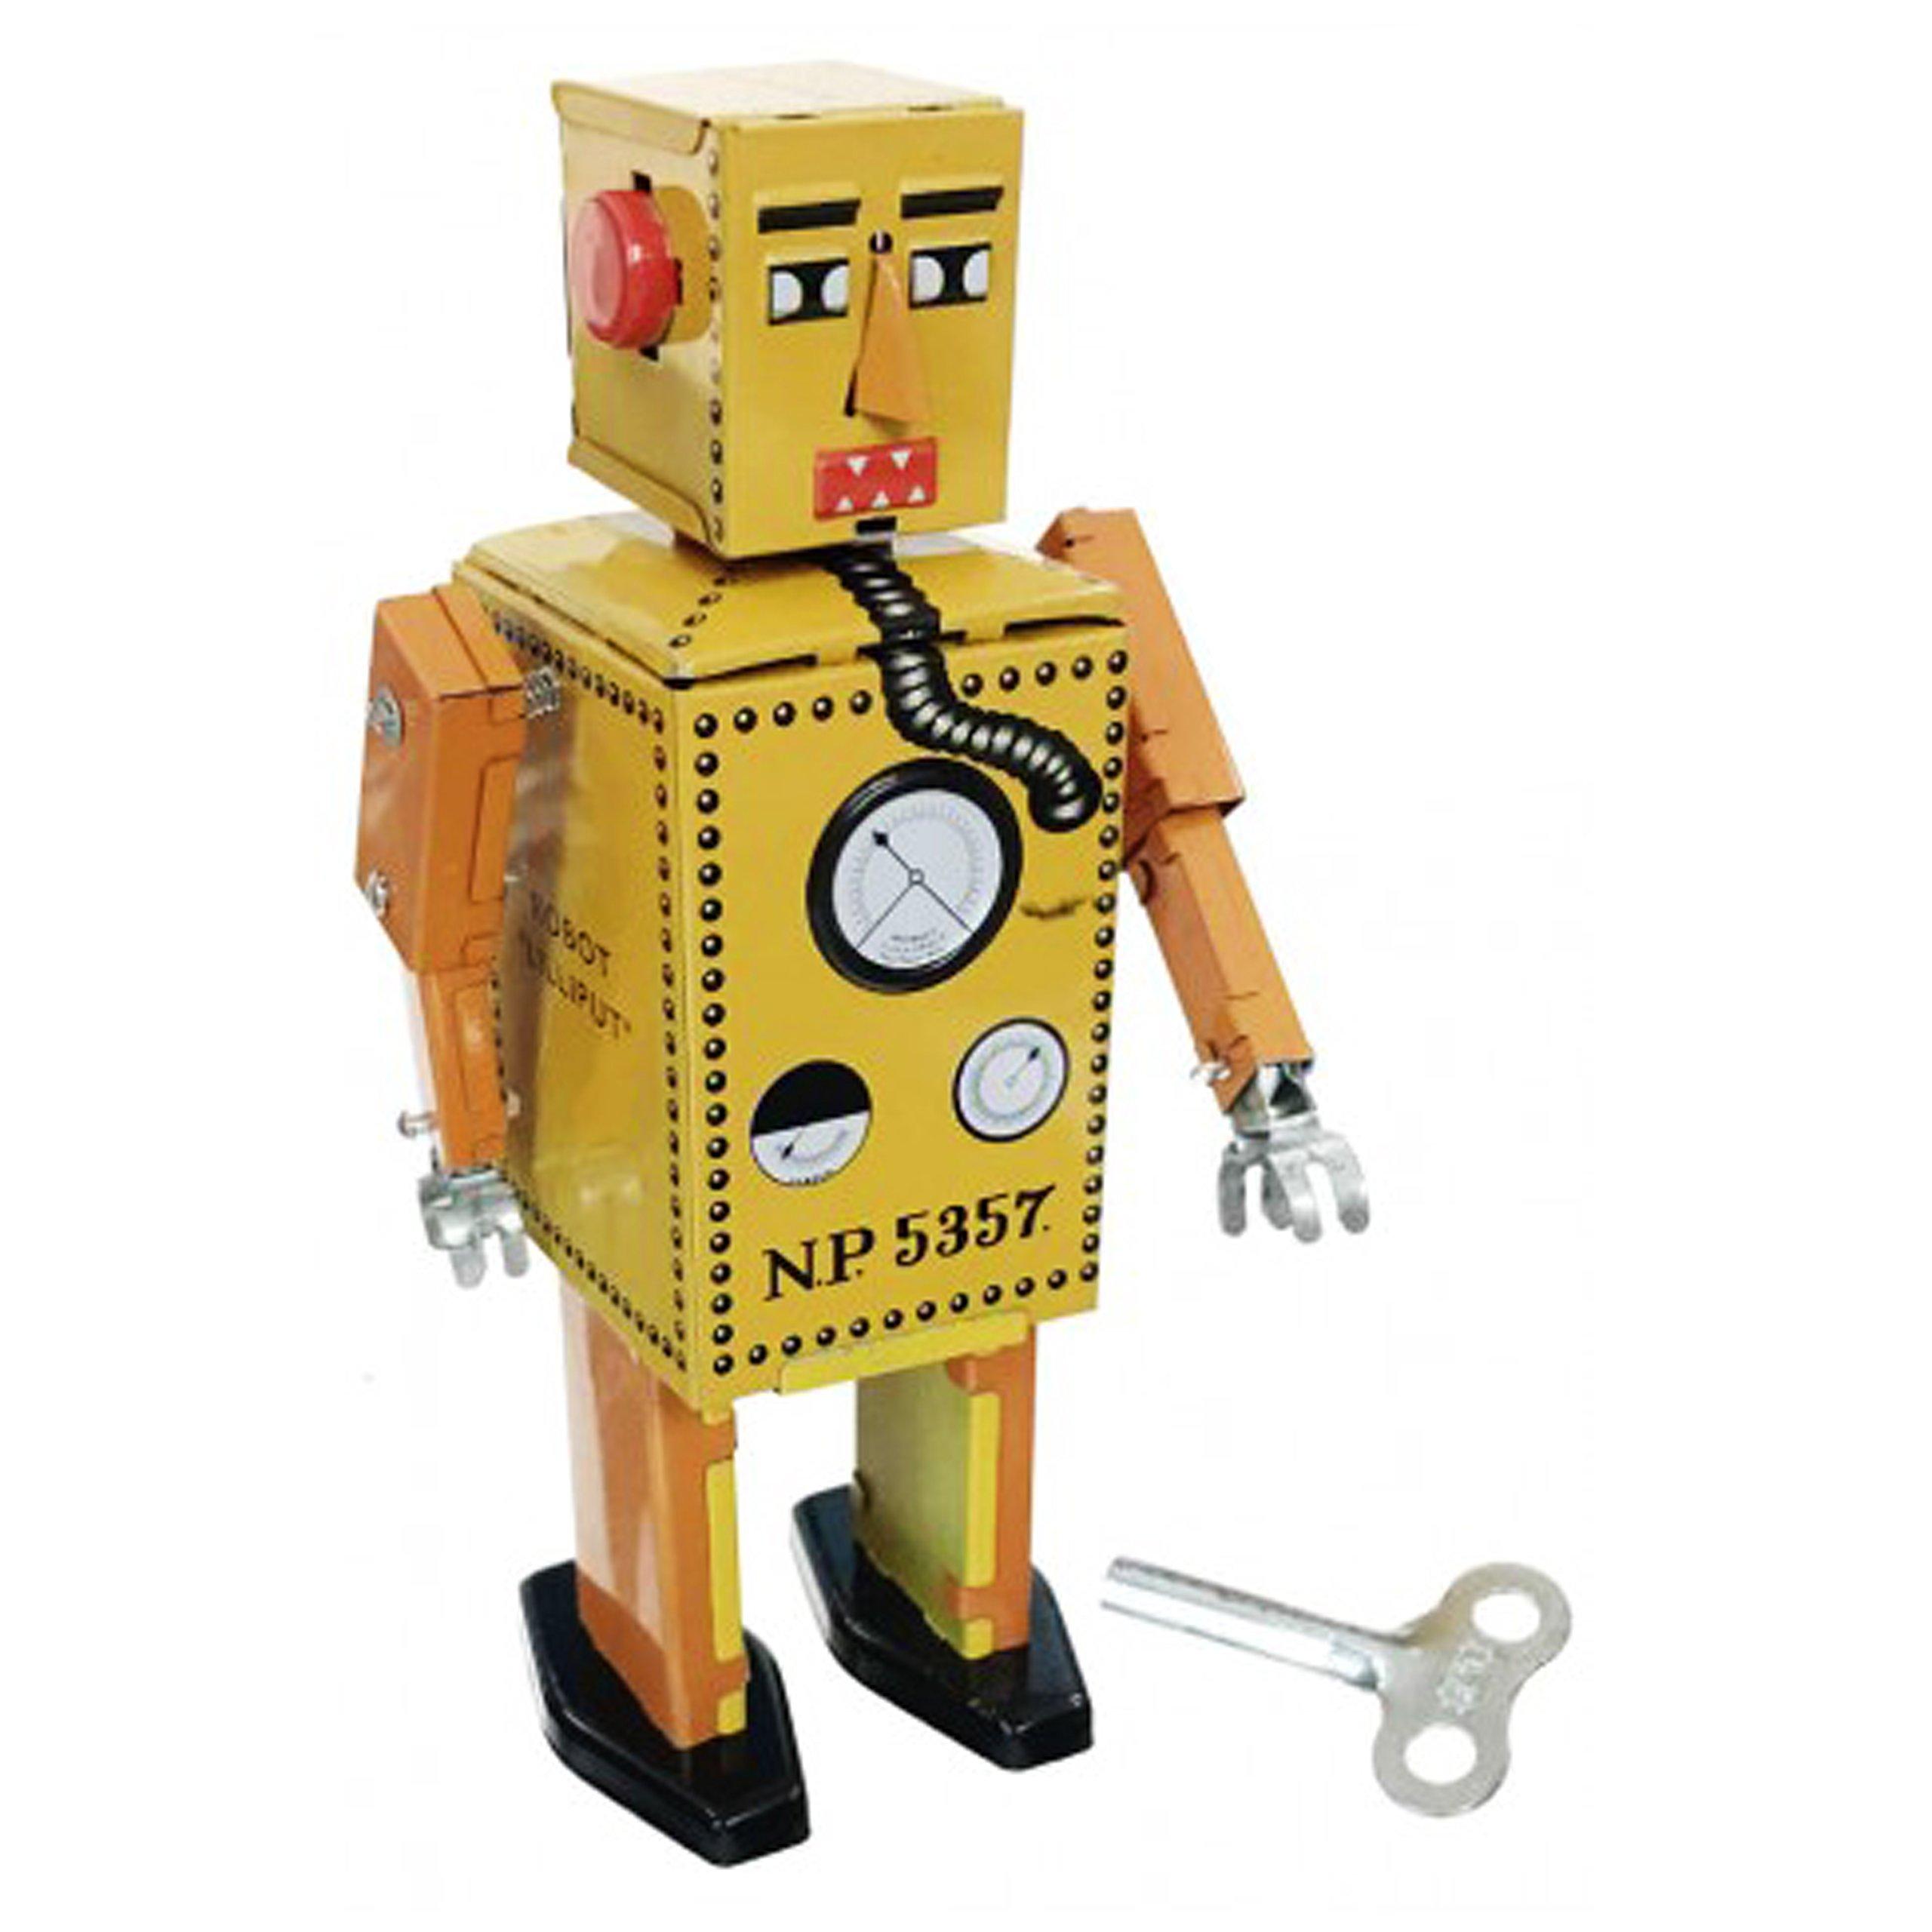 Off the Wall Toys Vintage Style Lilliput Robot Junior Yellow Tin Toy Original